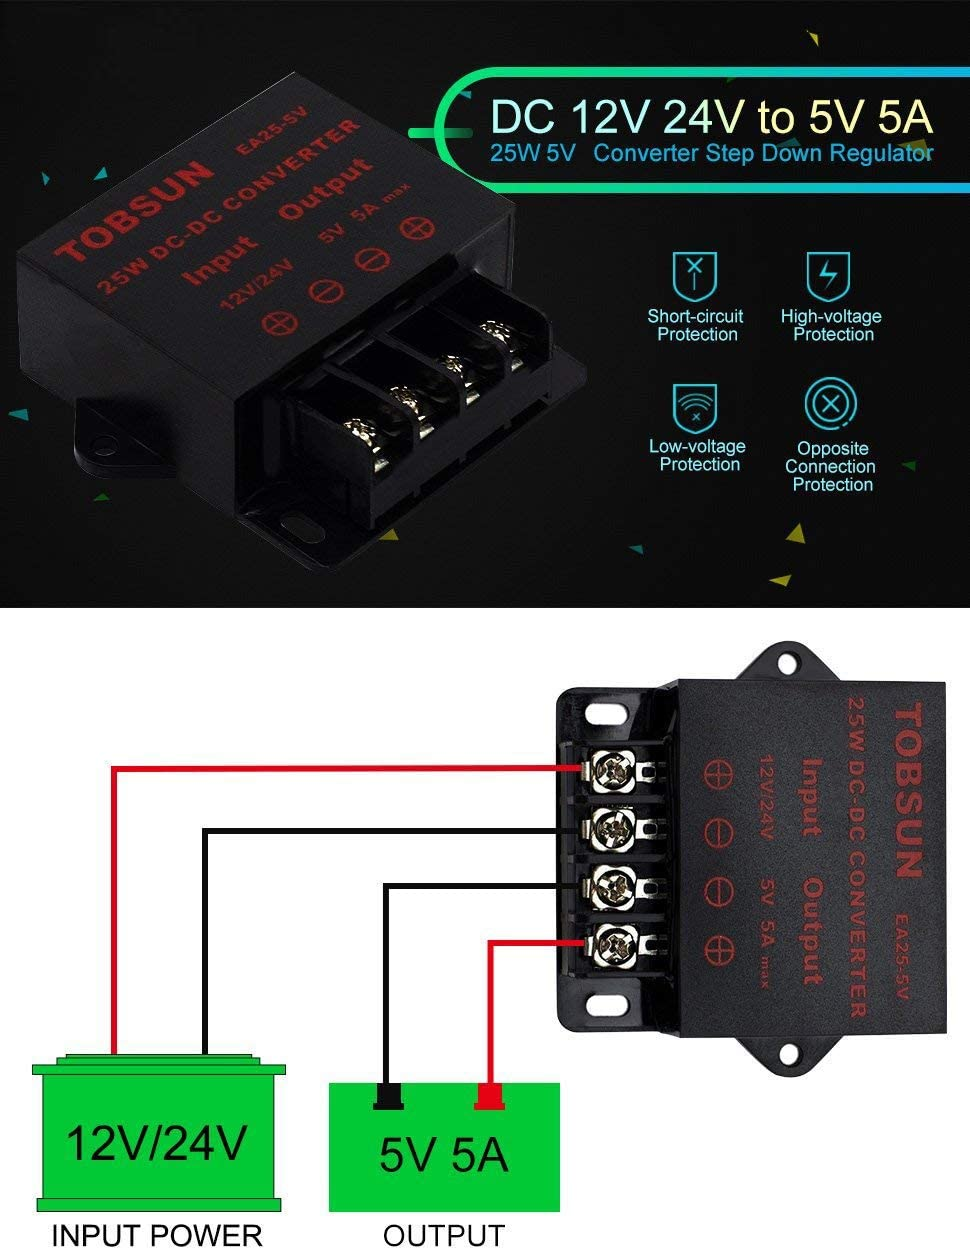 EPBOWPT DC 12V 24V to DC 5V 10A 50W Converter Regulator 5V 50W Power Supply Step Down Module Transformer